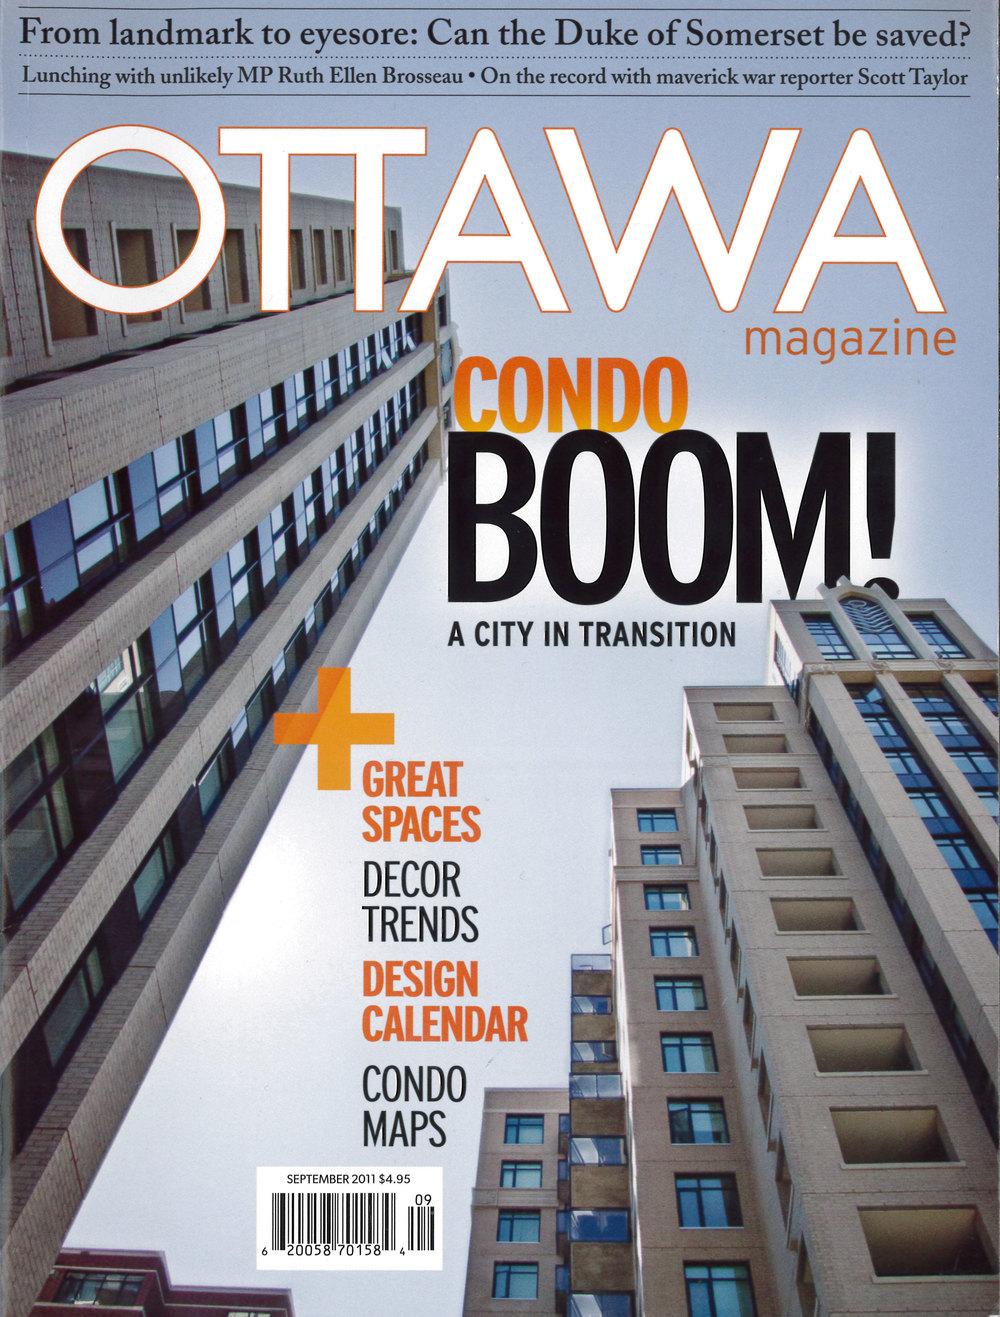 Ottawa Magazine Condo Boom Cover.jpg